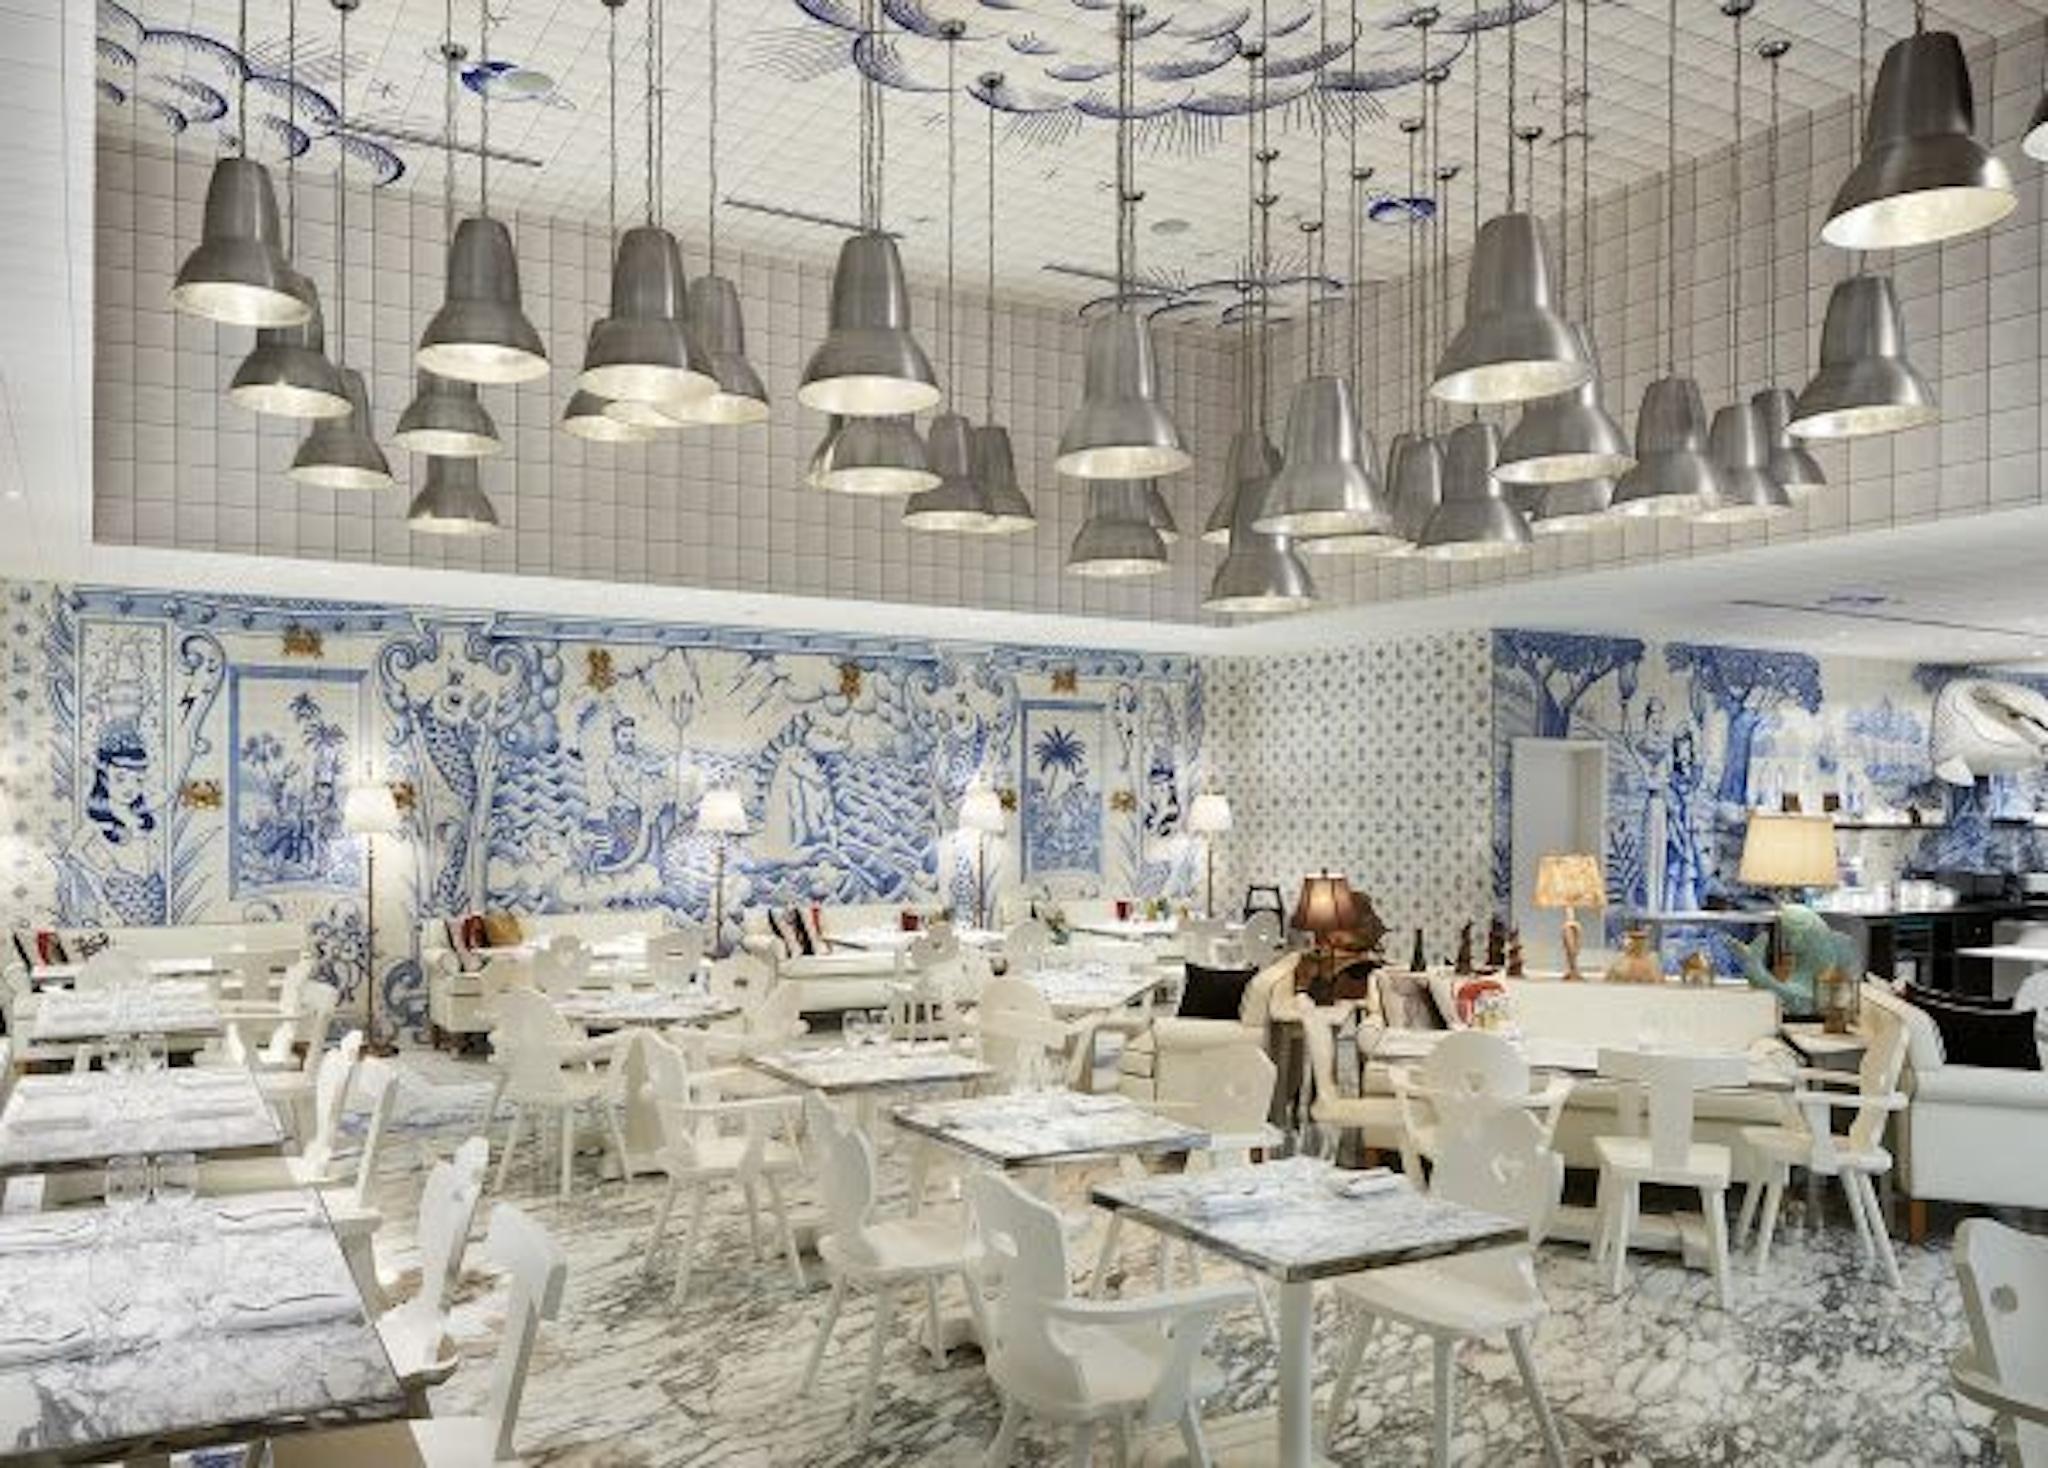 Sea themed room at Bazaar Mar by Jose Andres at SLS Brickell